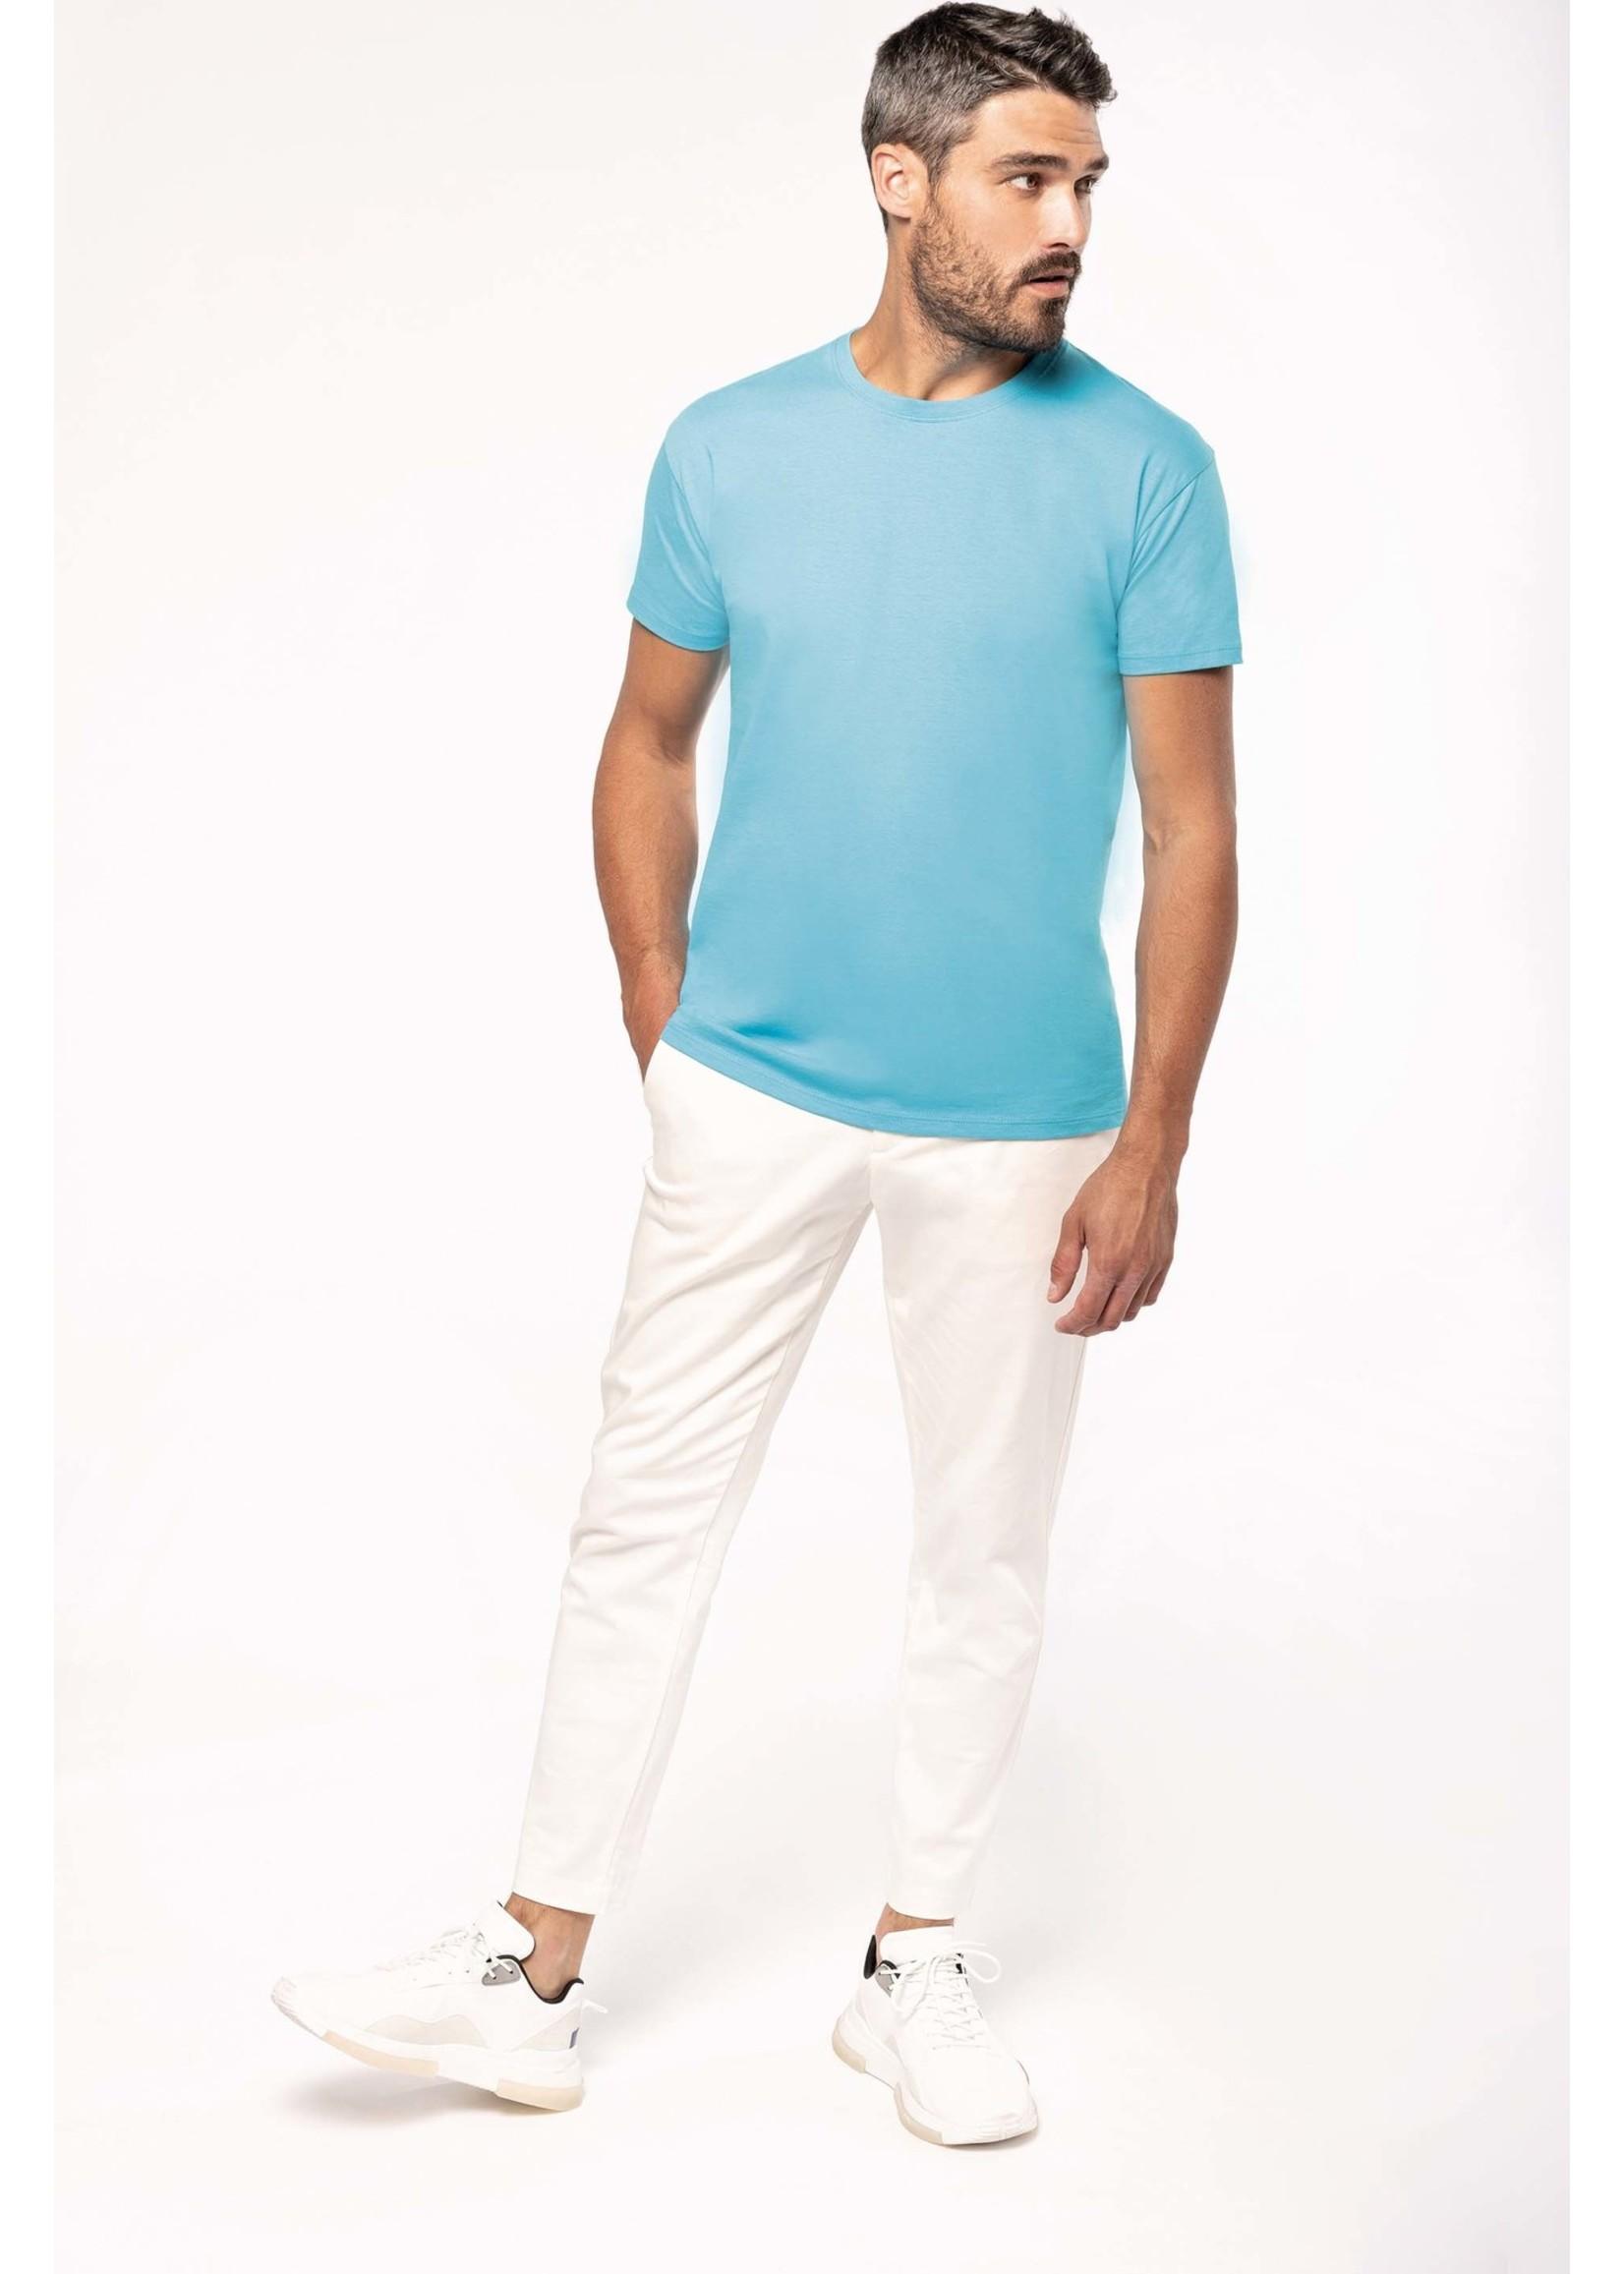 Eco-Friendly Unisex T-shirt - Light Royalblue